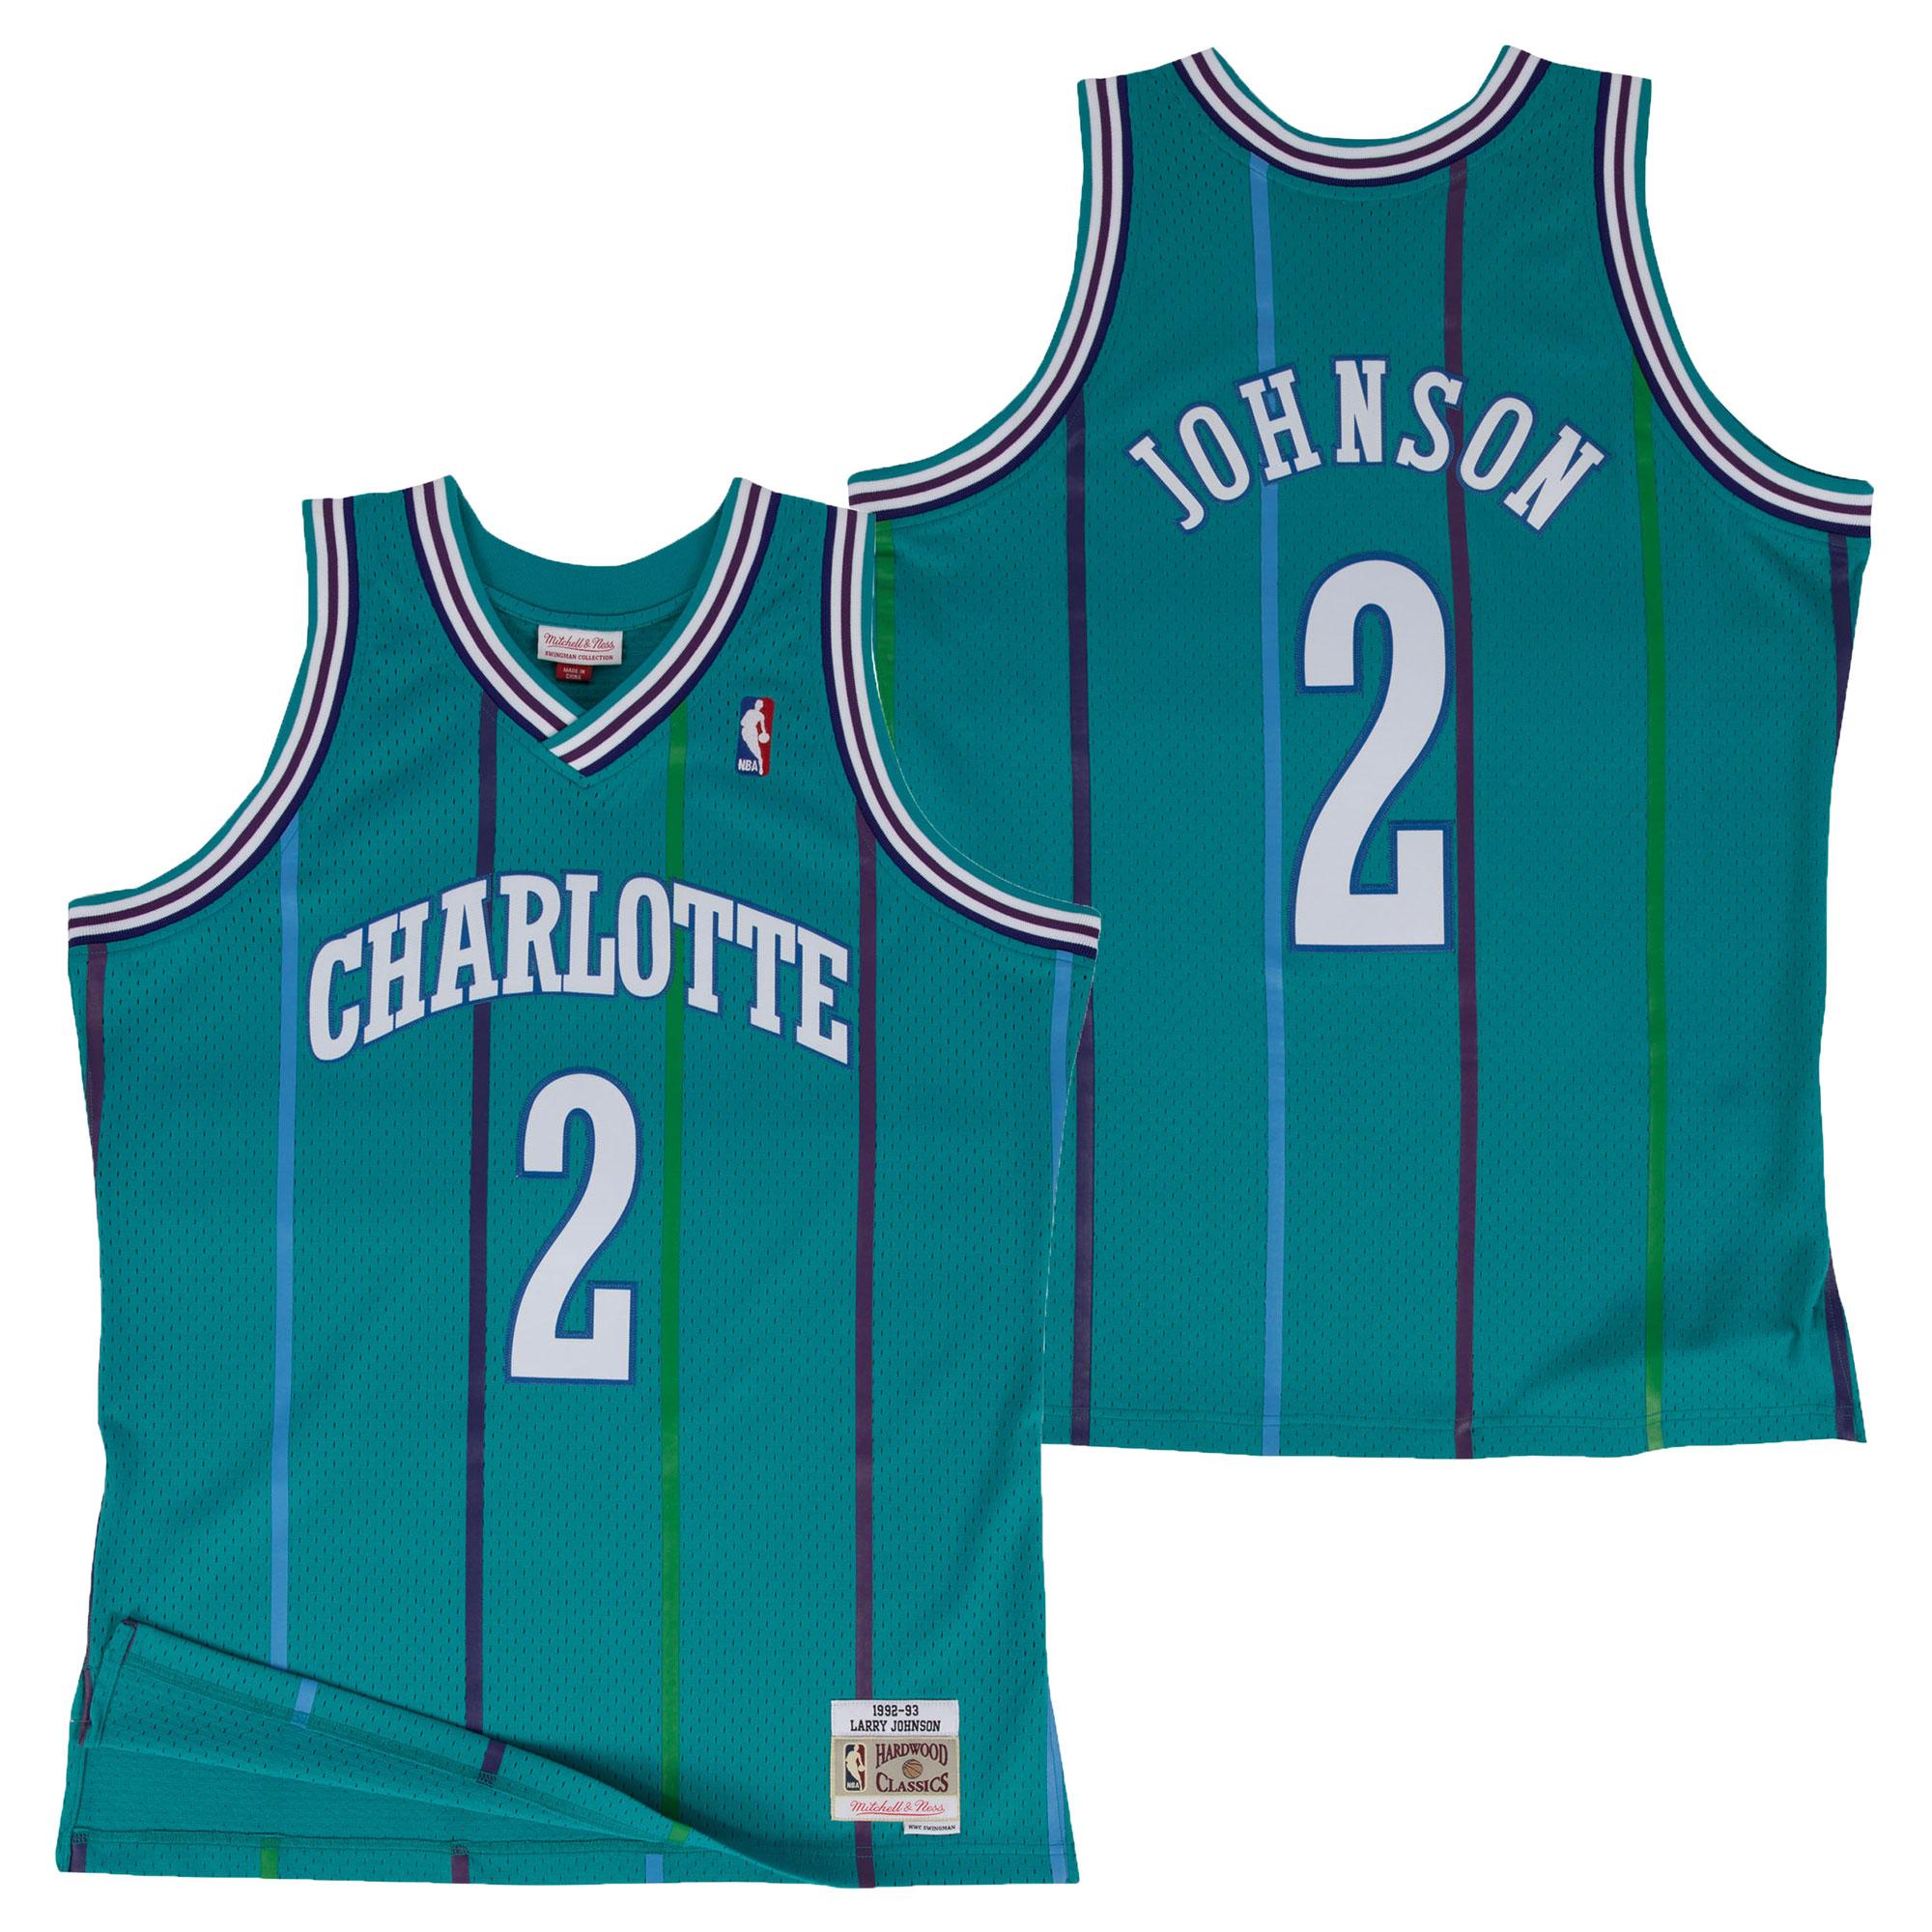 Camiseta de Larry Johnson de los Charlotte Hornets Hardwood Classics Road Swingman para hombre